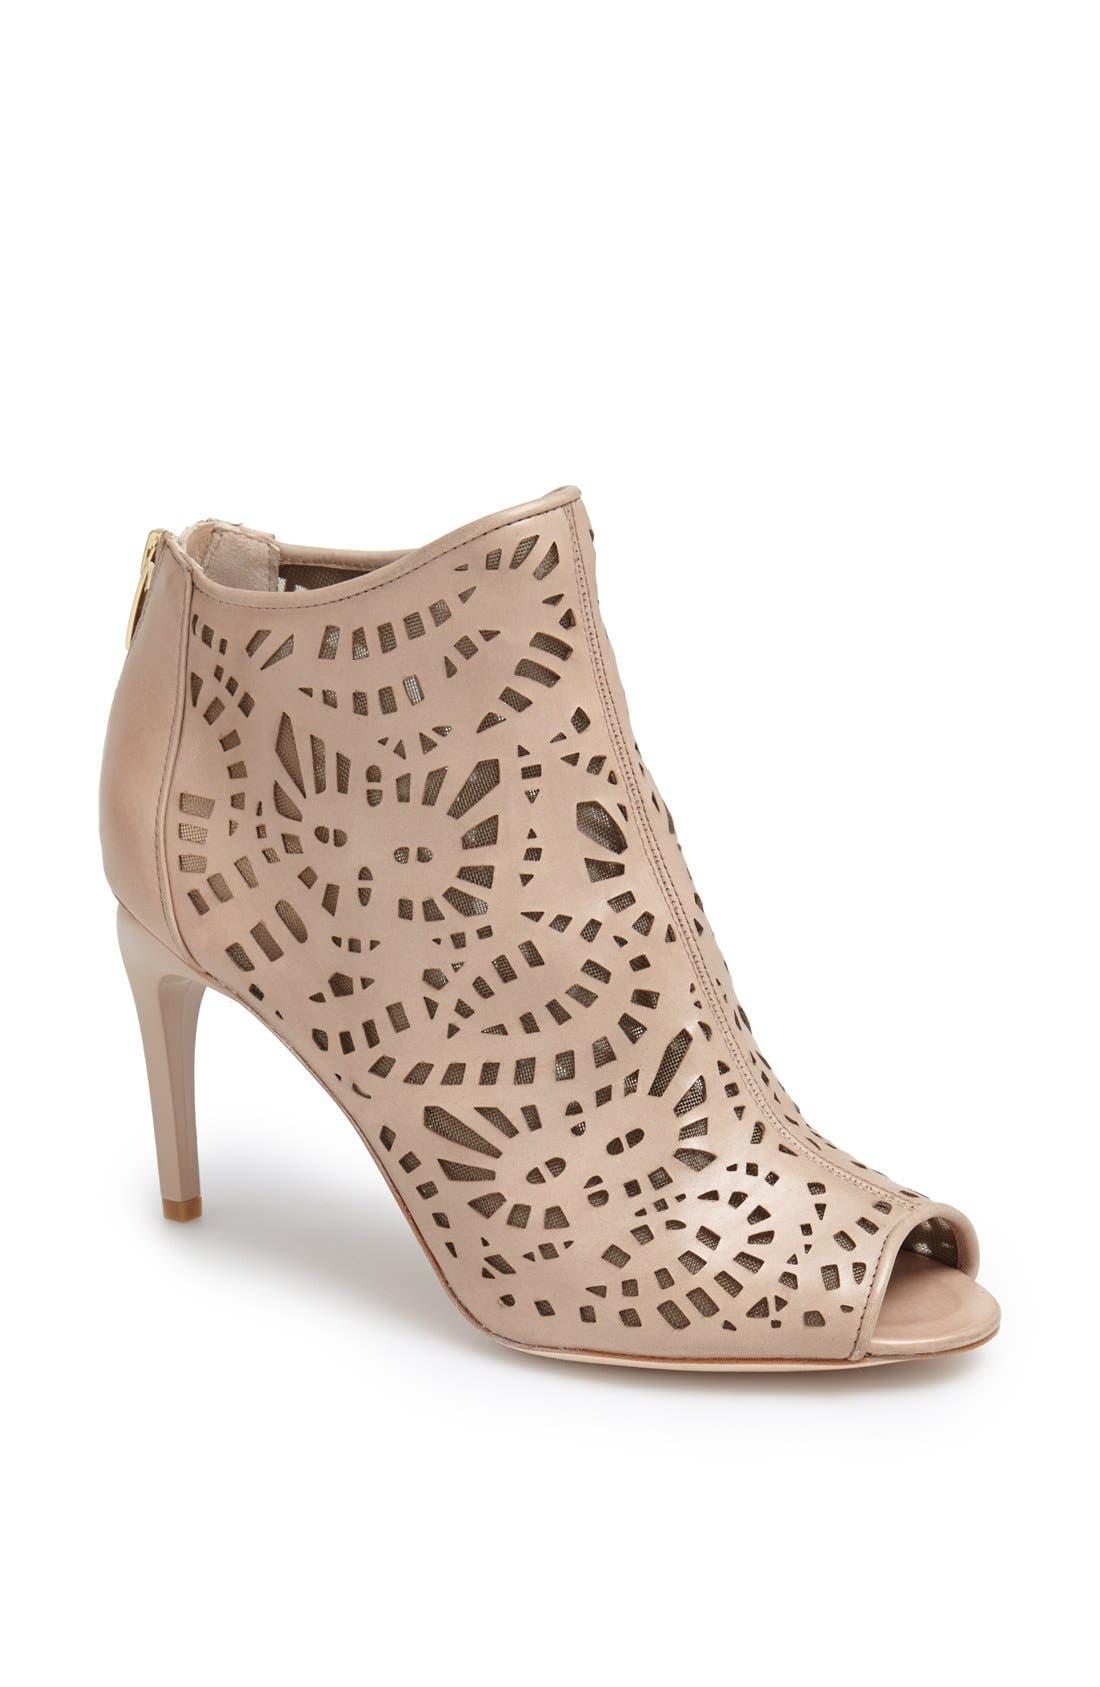 Alternate Image 1 Selected - Carolinna Espinosa 'Burbank' Geometric Cutout Leather Bootie